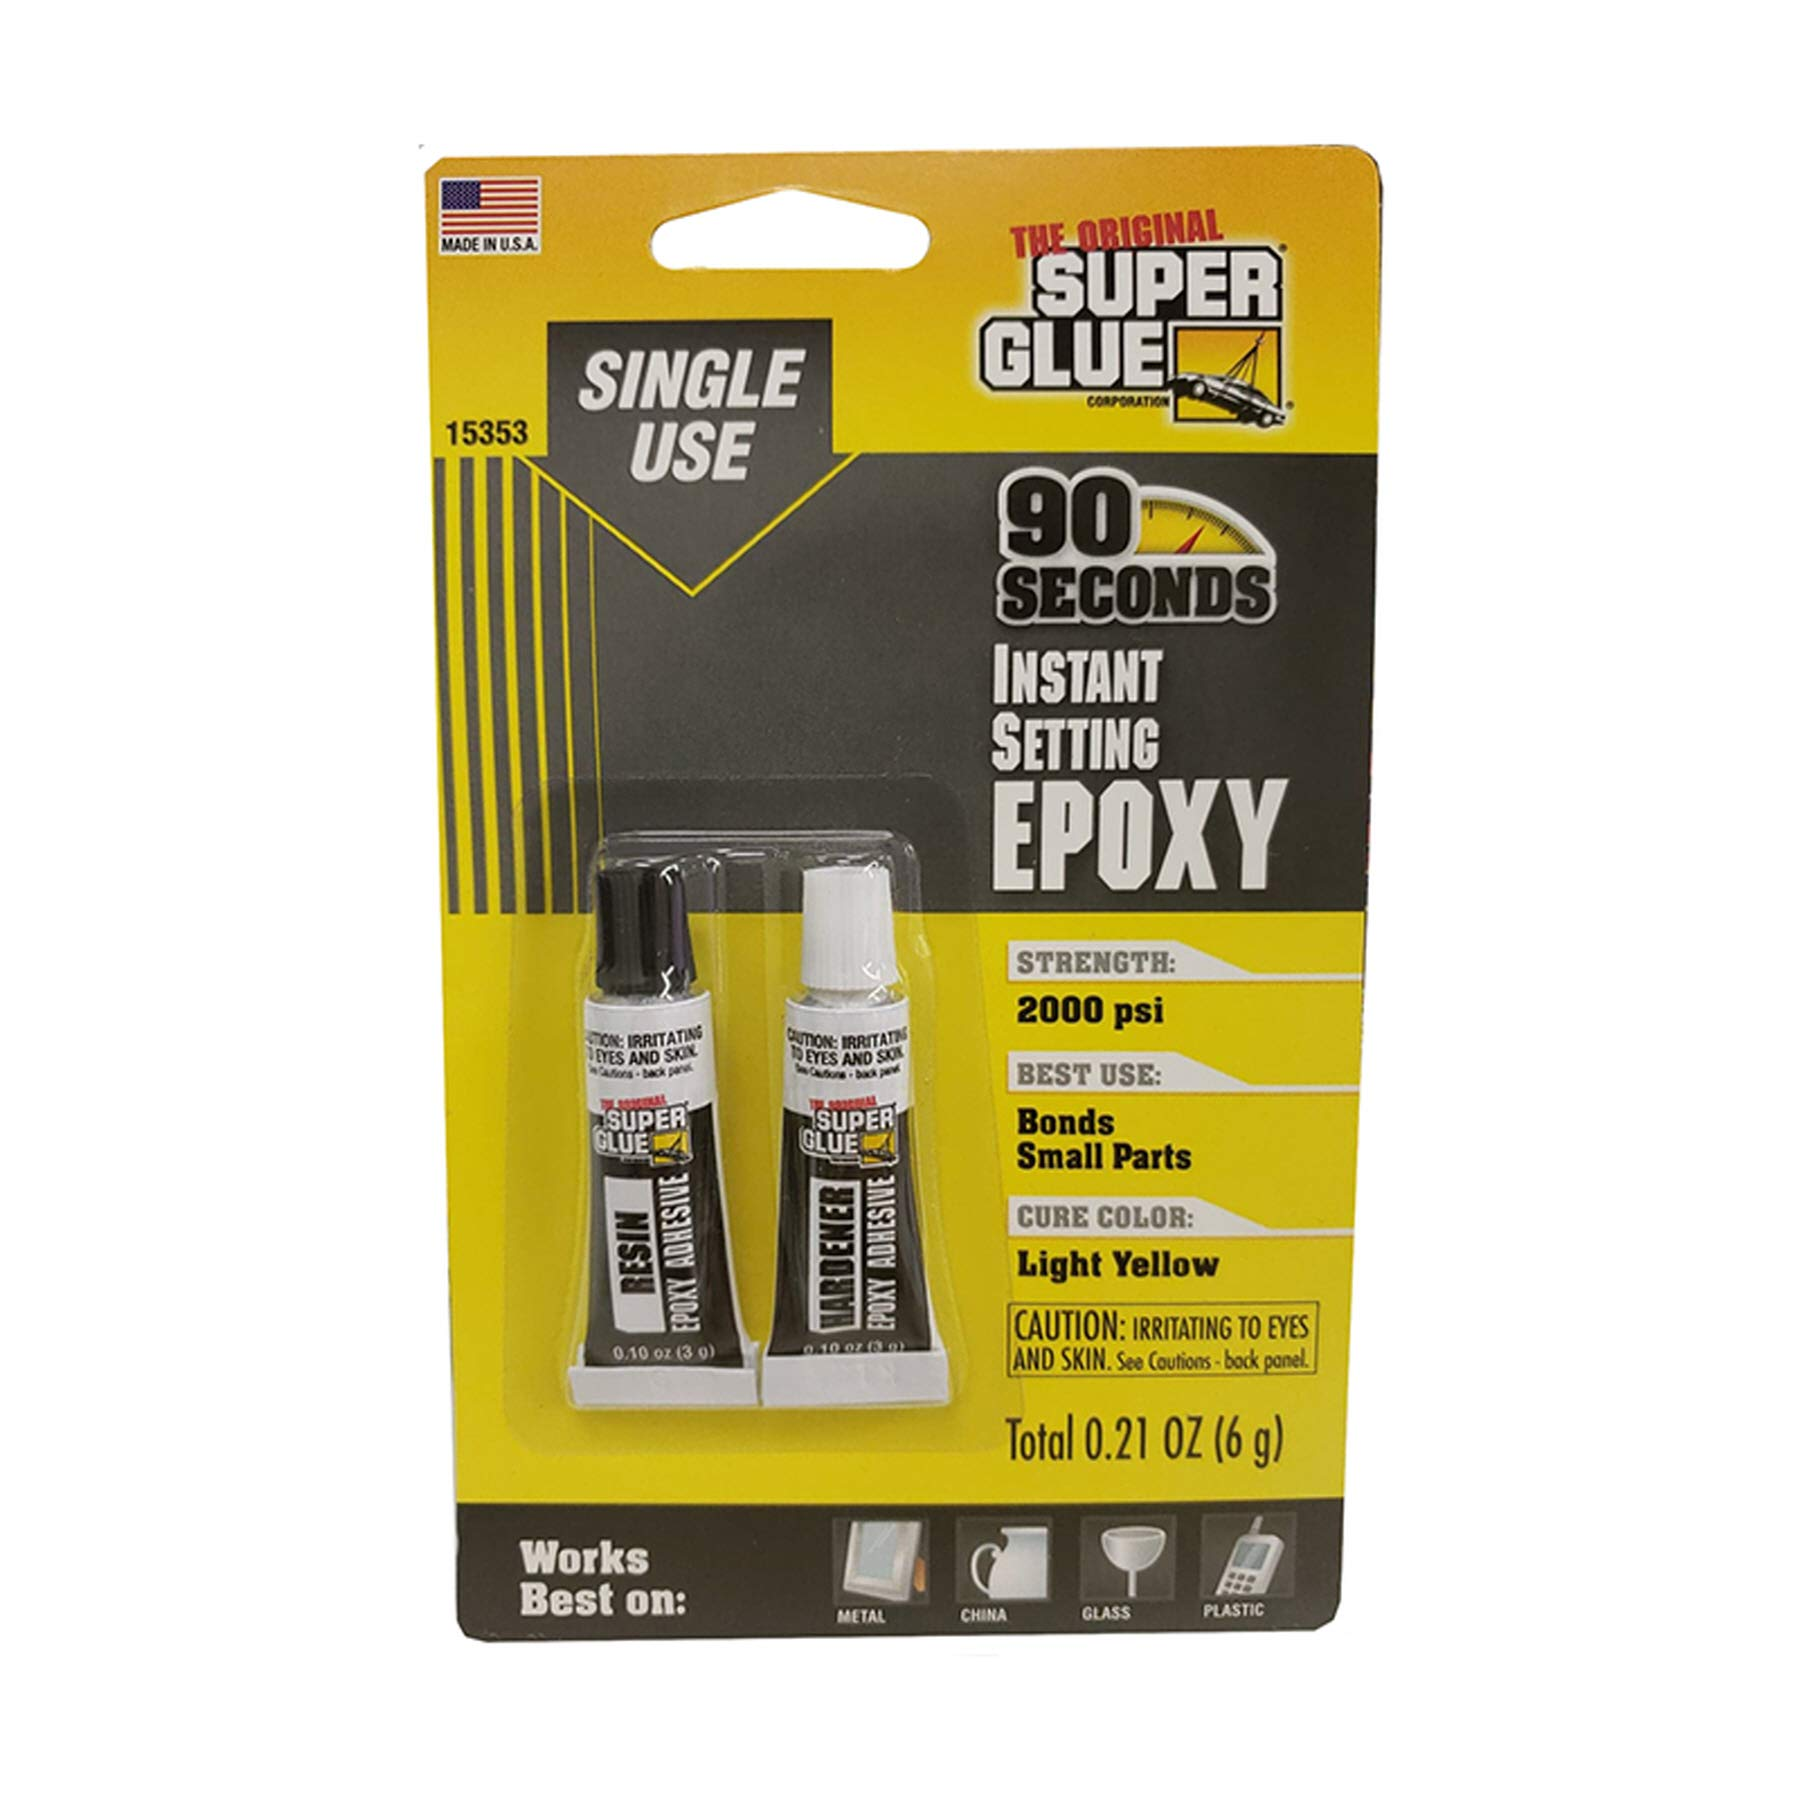 (Pack of 24, 48 Ct) The Original Super Glue Super Glue Instant Setting, 3 Gram Tube, 2pk